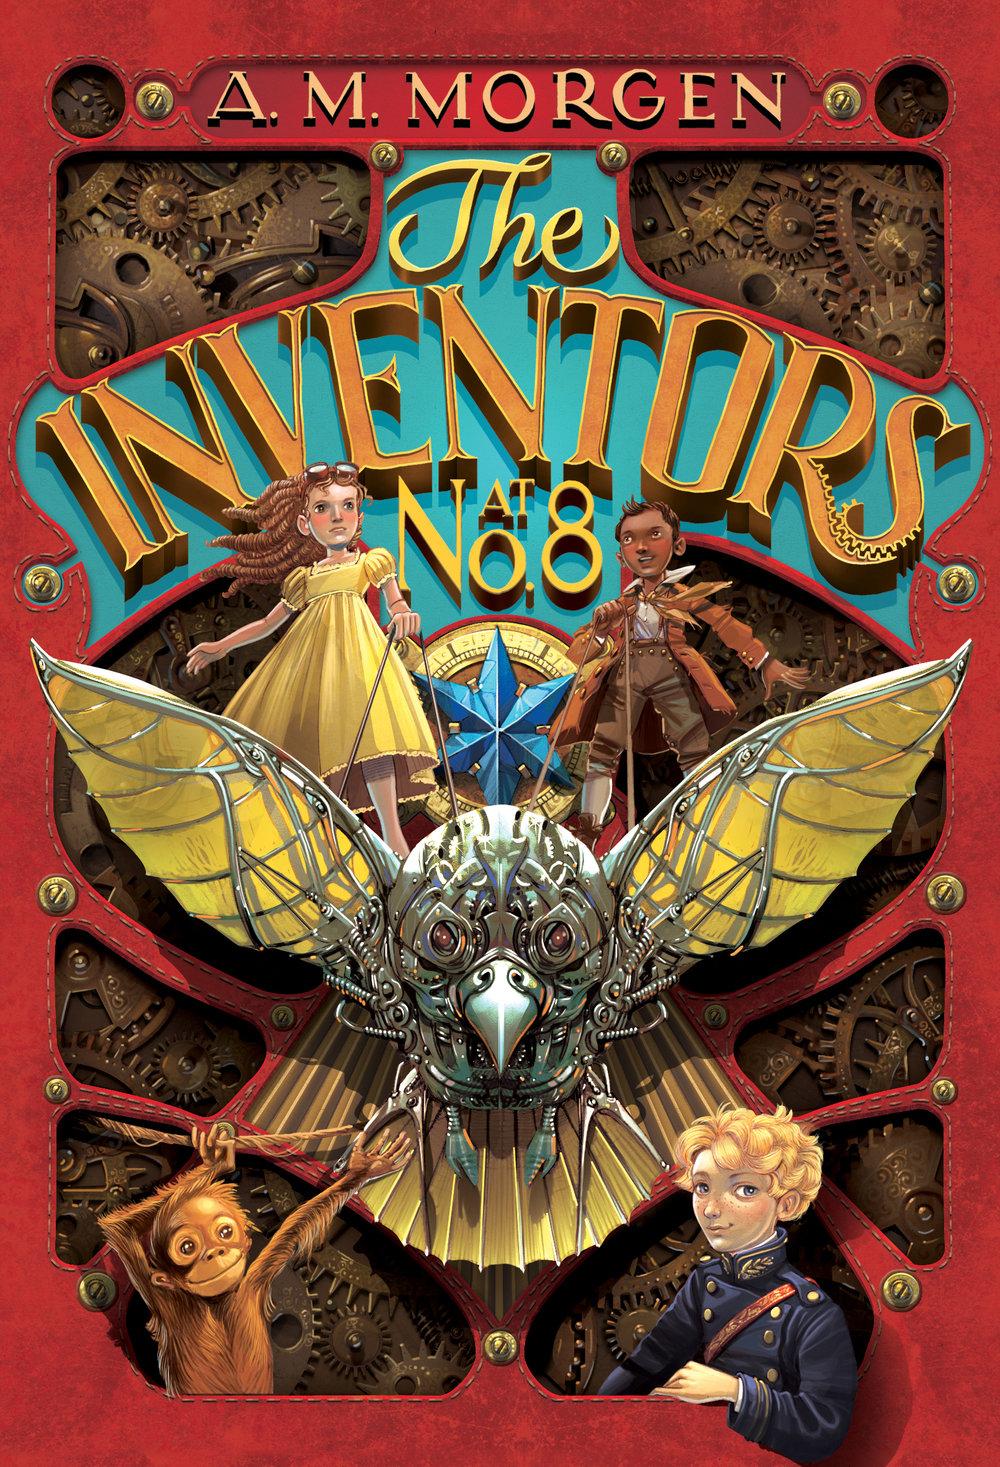 INVENTORS+final+cover.jpg